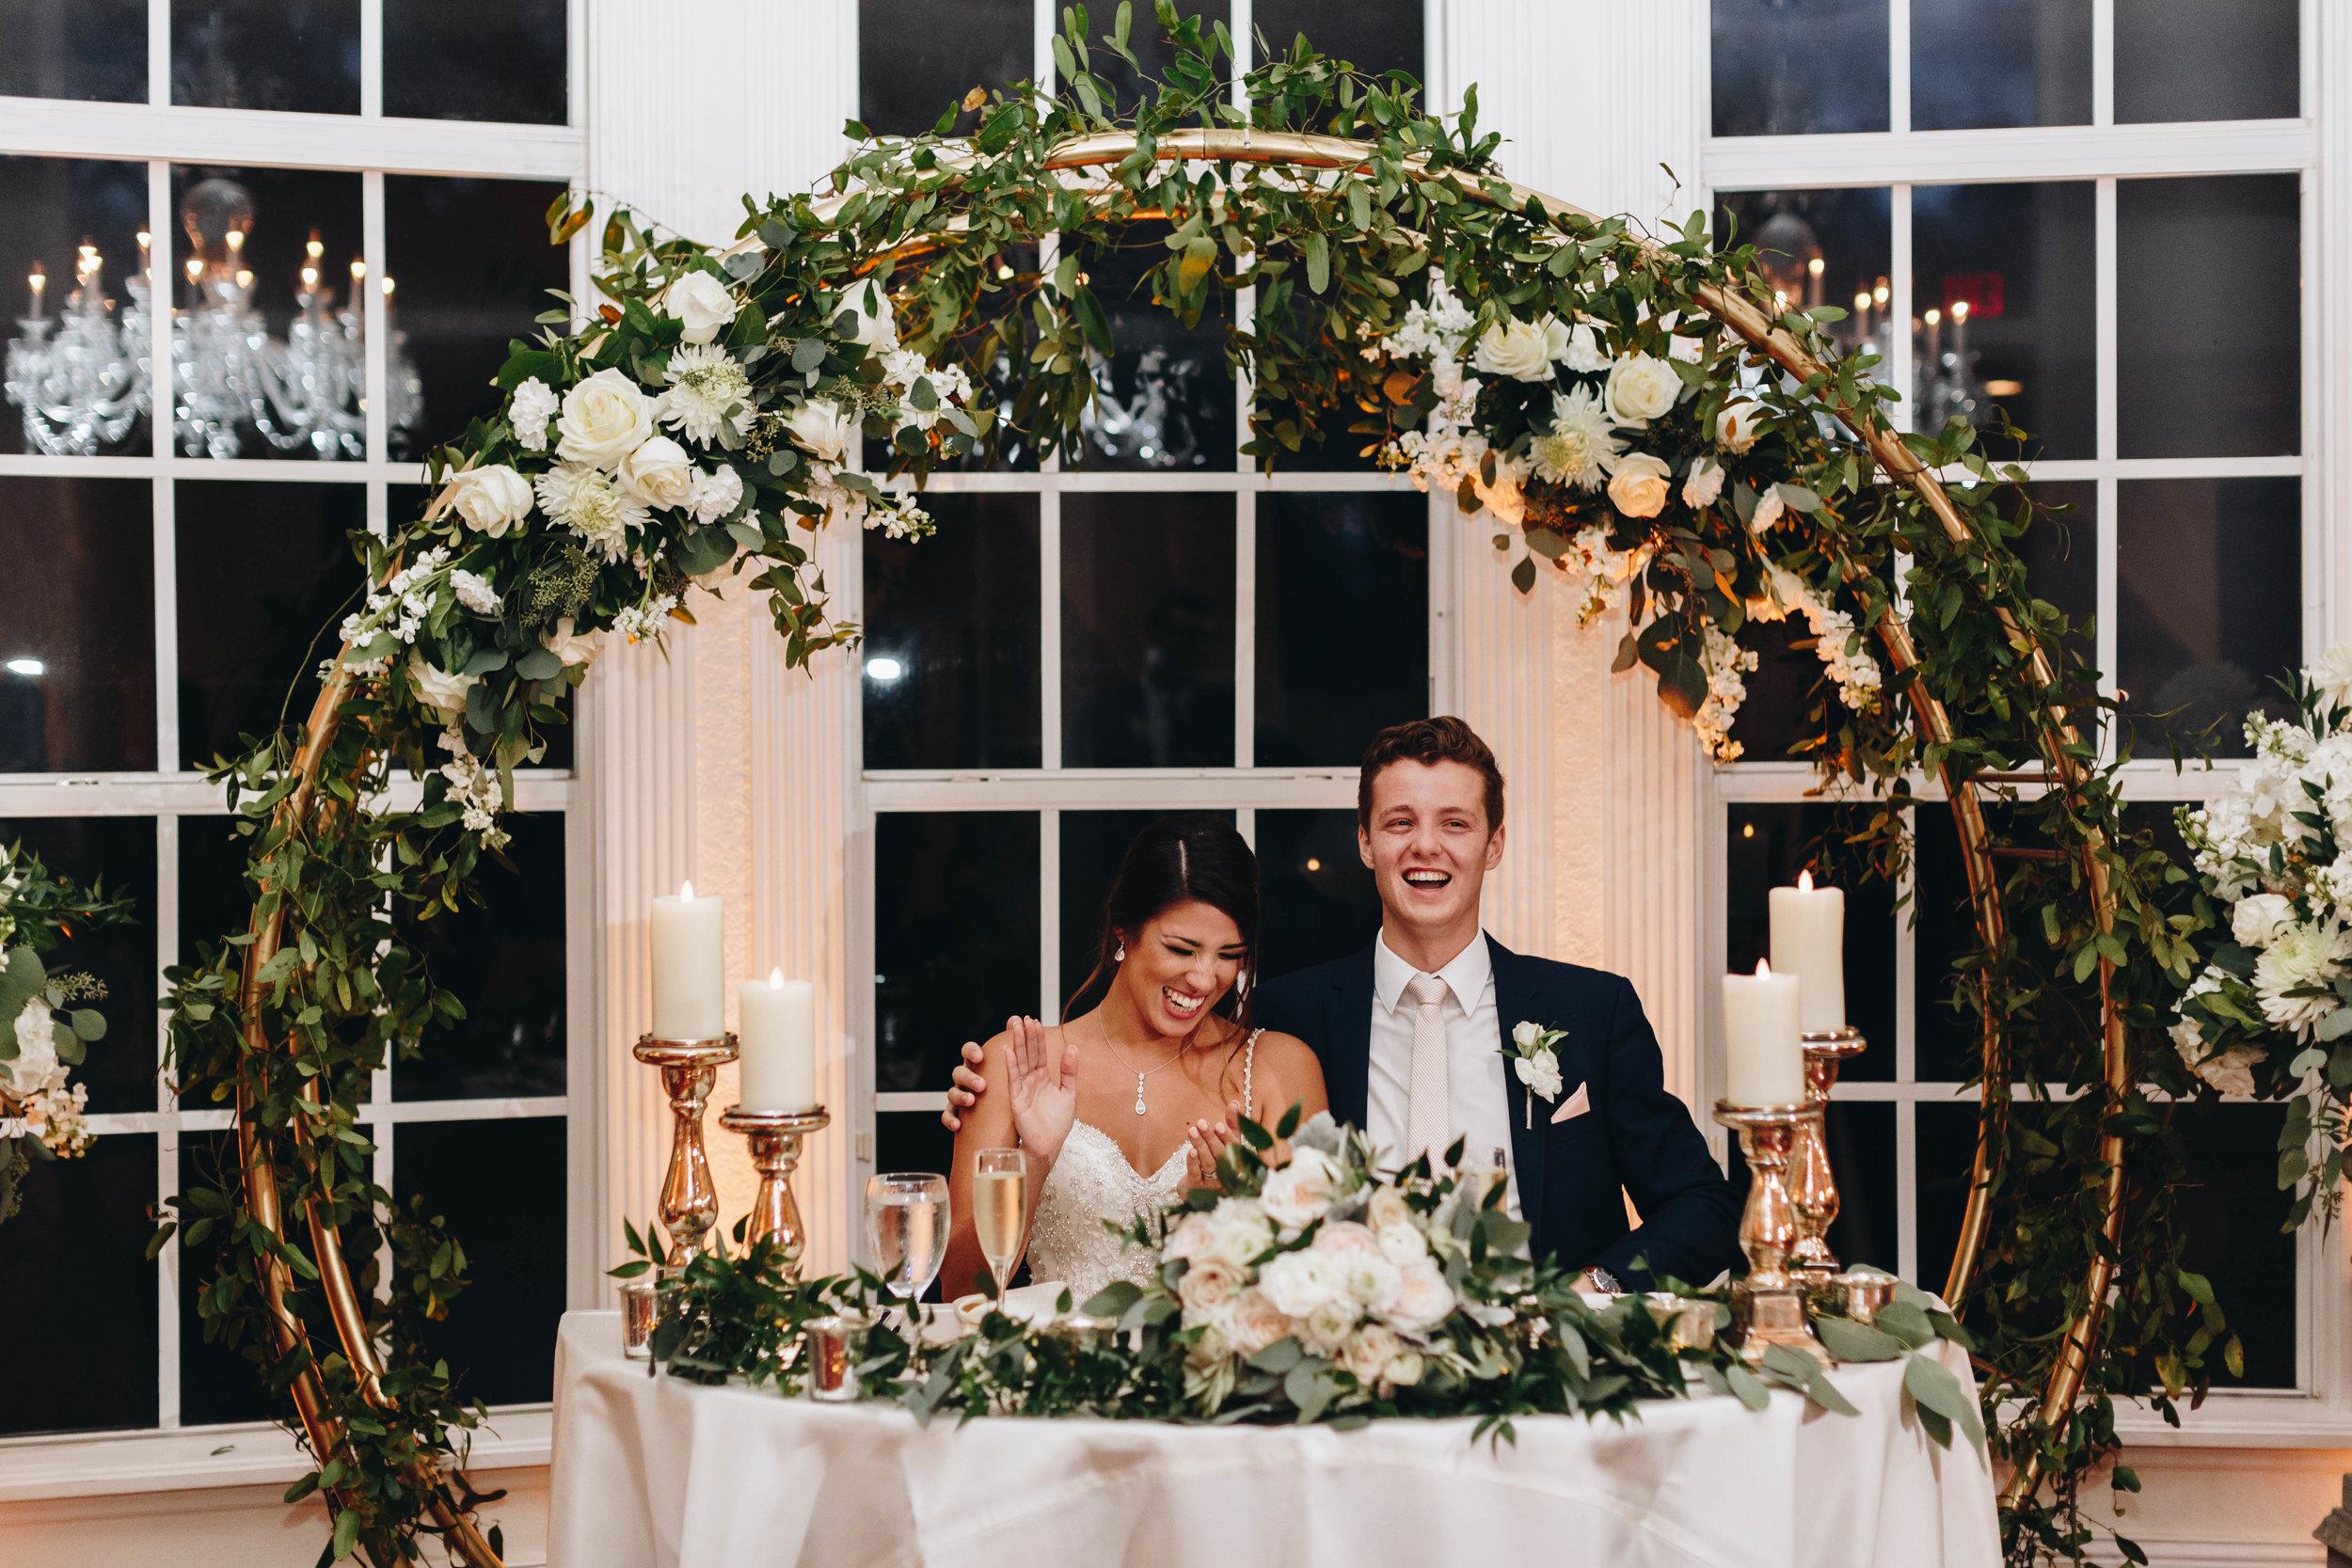 54e2a-luxmoregrandestatewedding.jpgluxmoregrandestatewedding.jpg